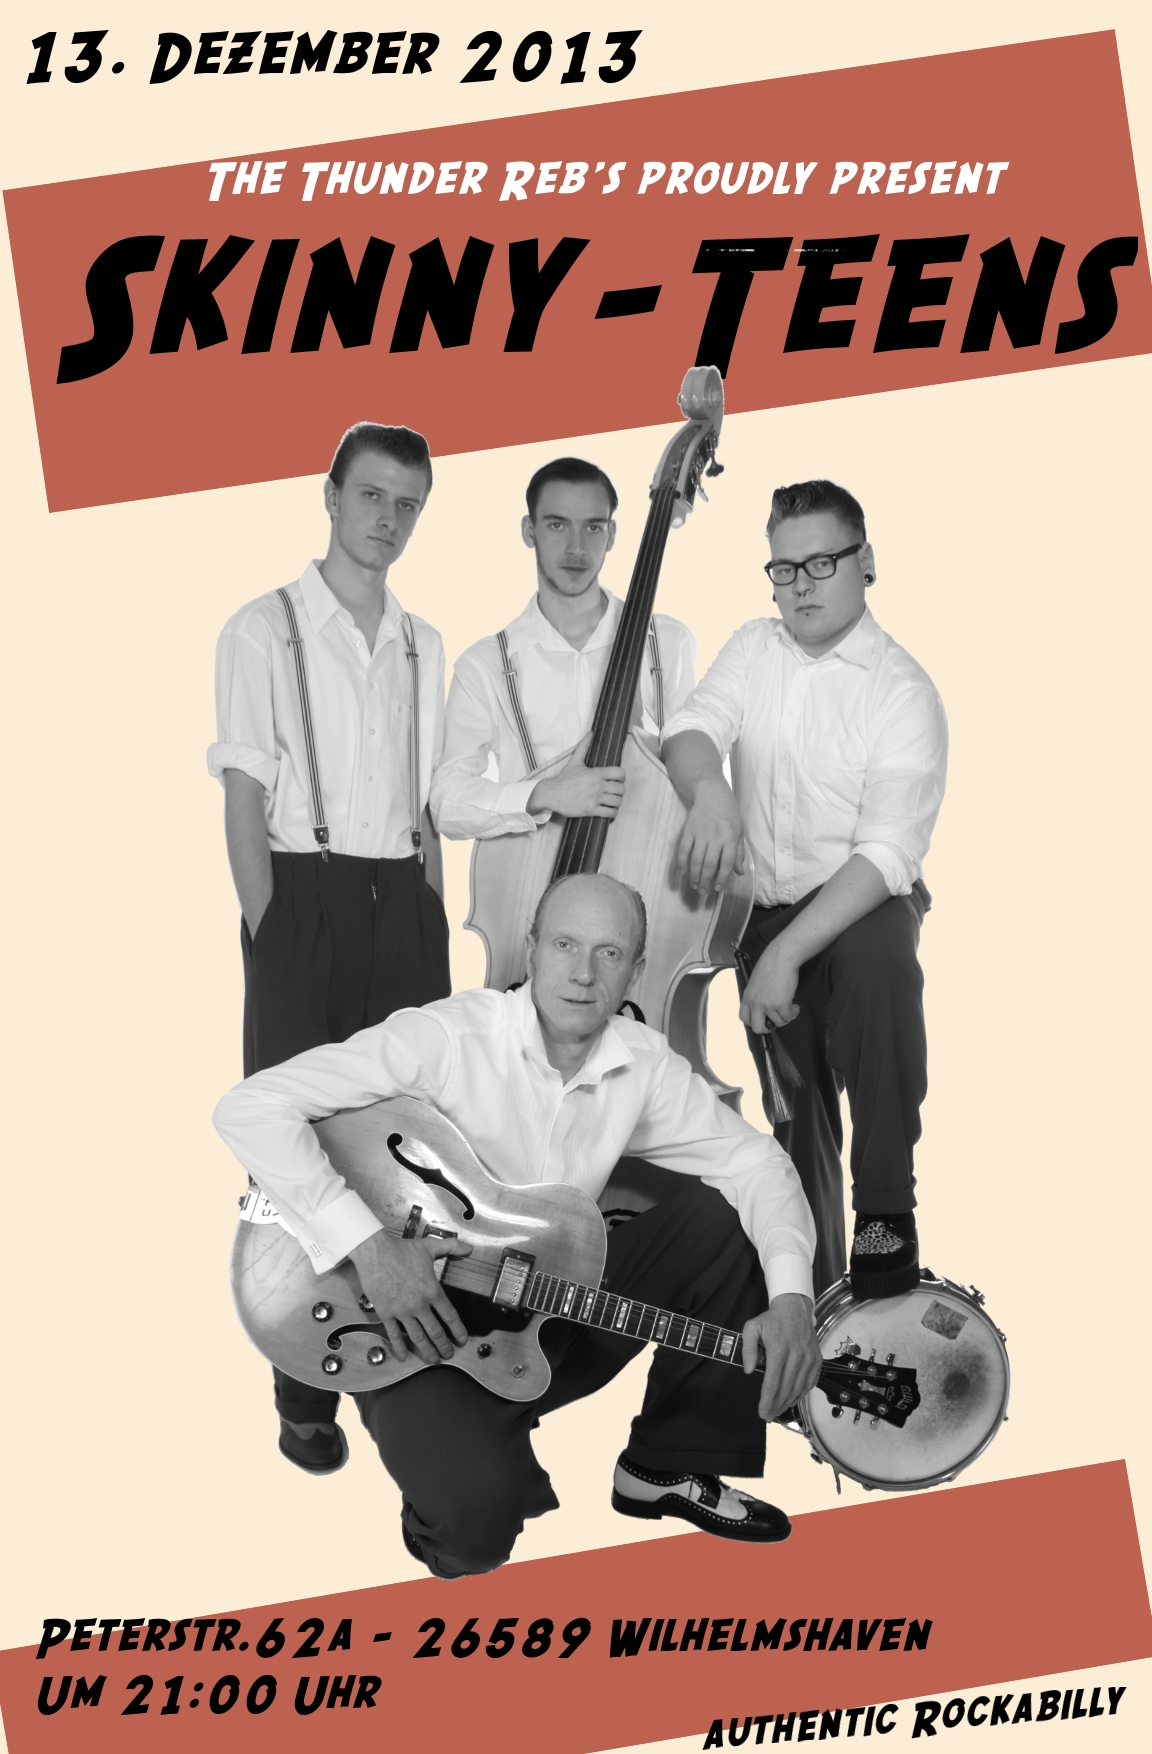 Skinny Teens For 49